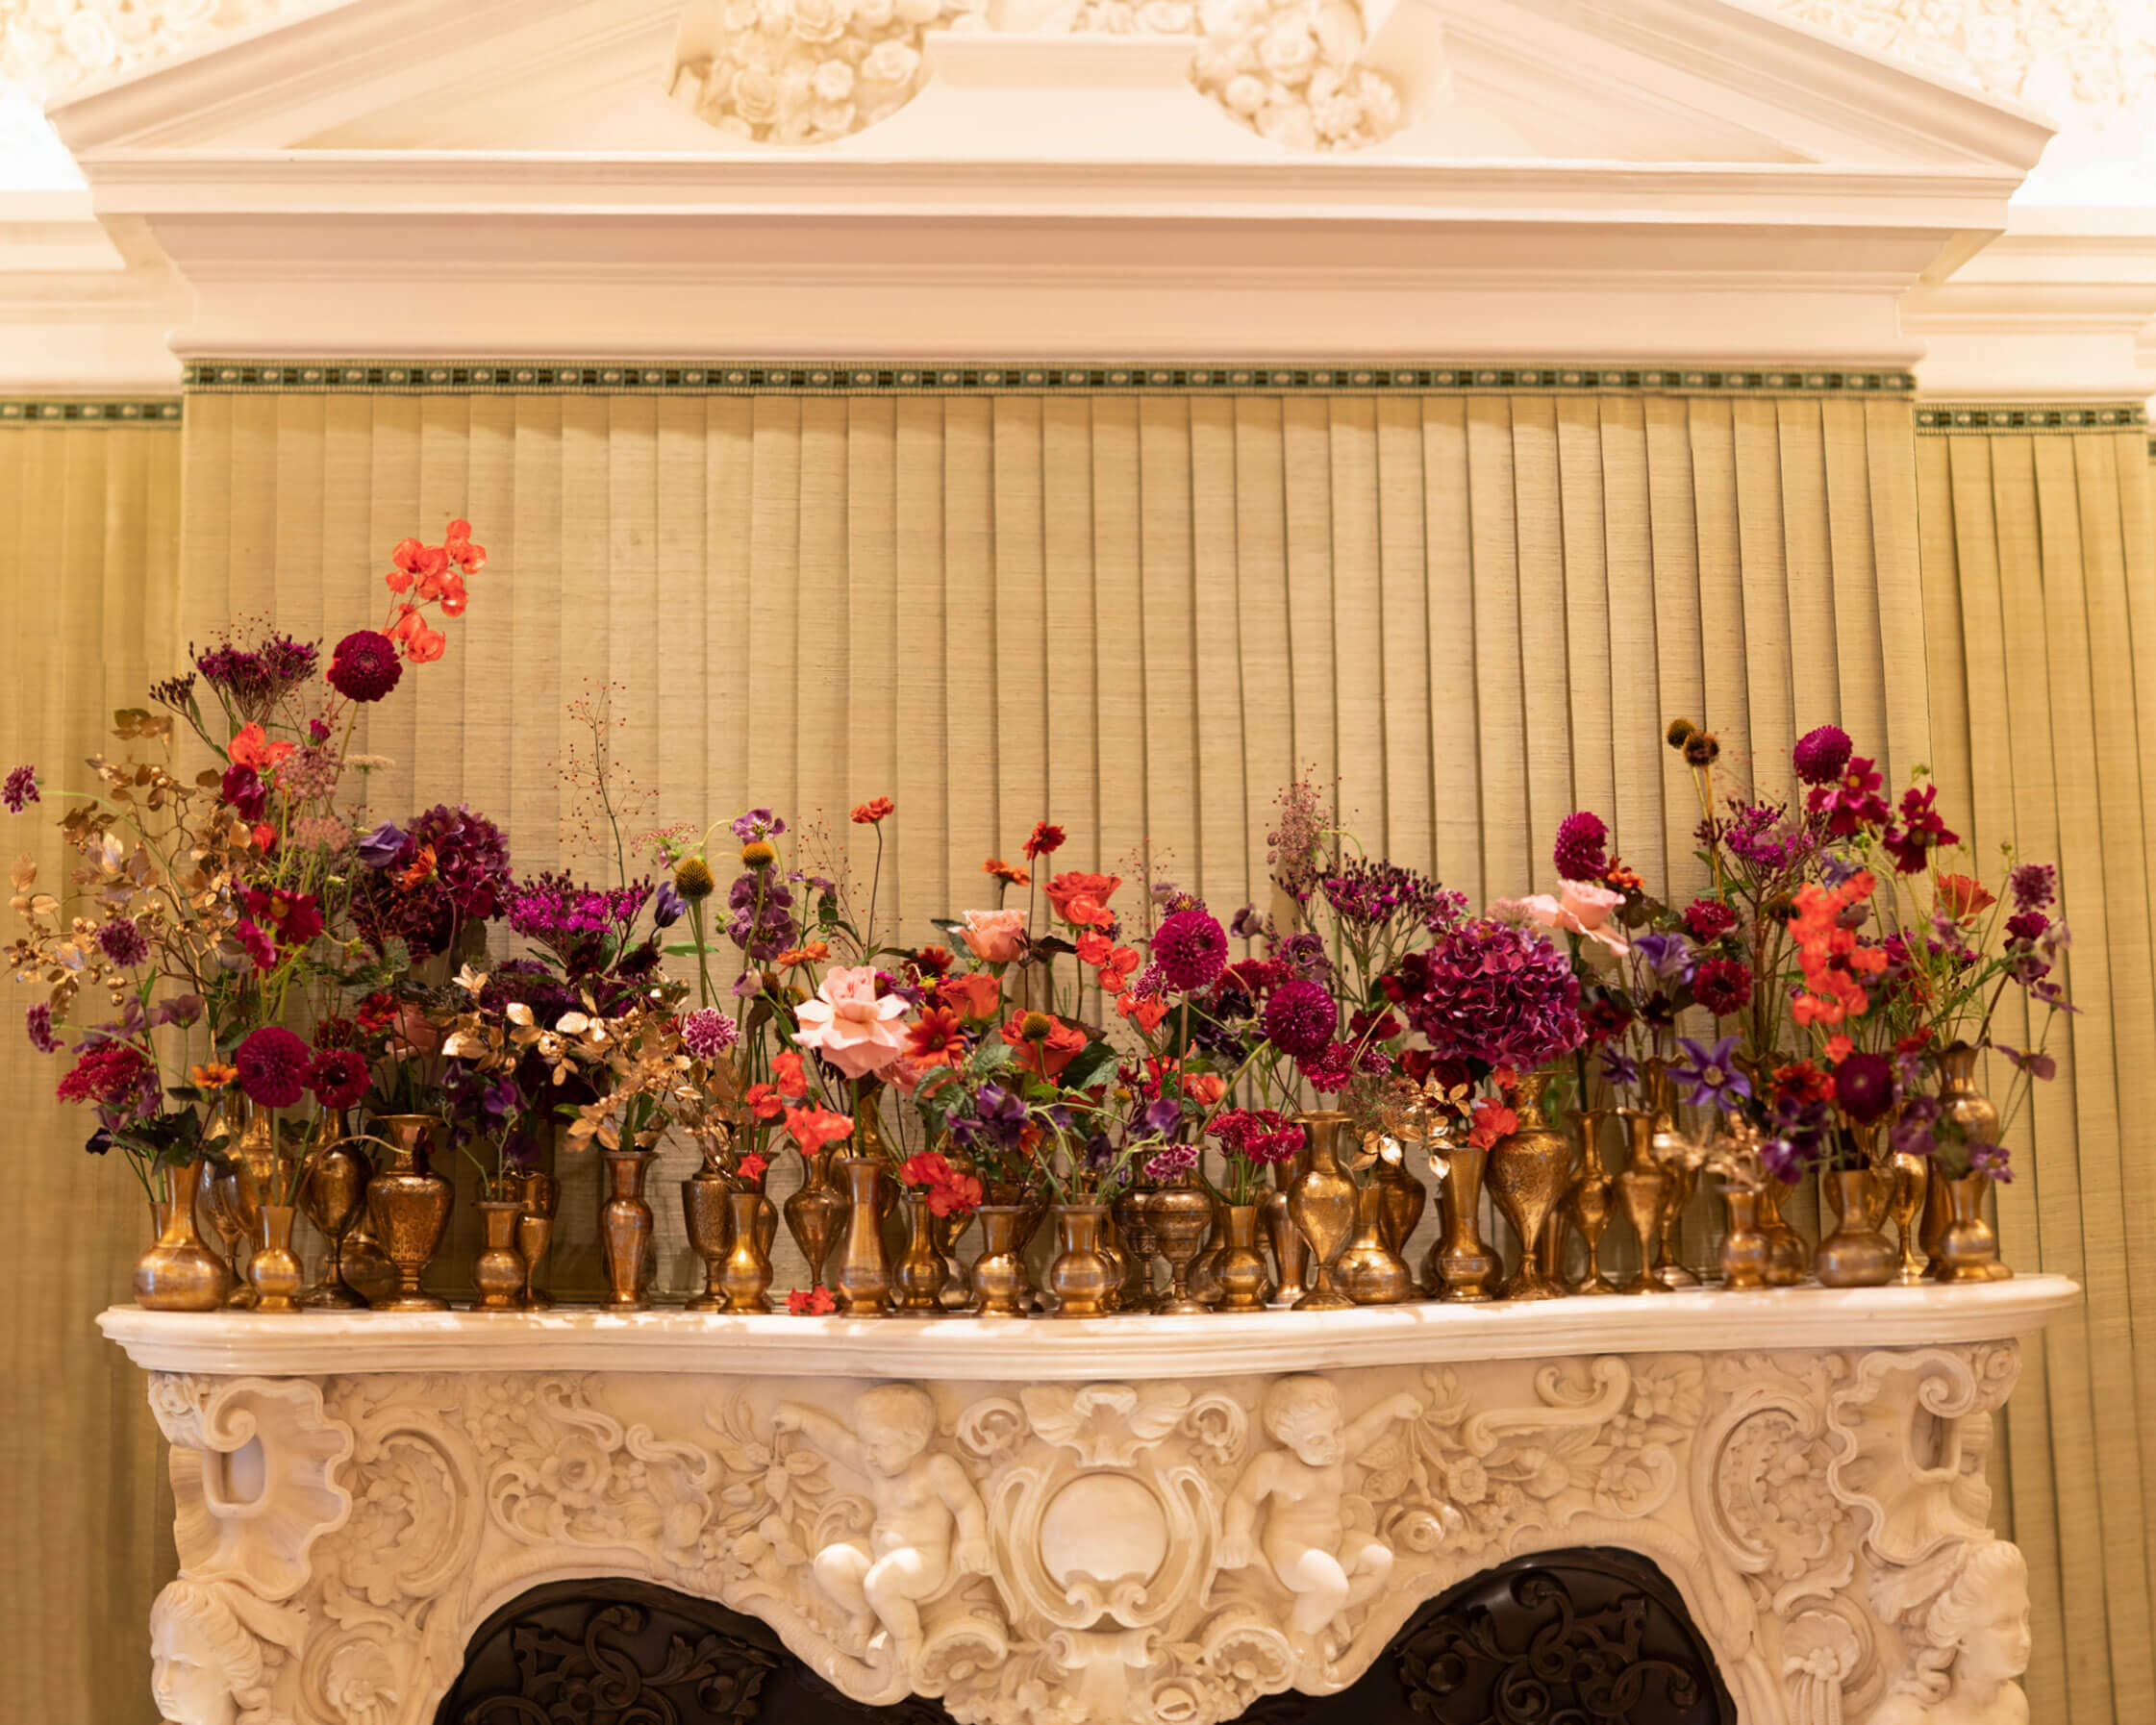 Master Florist Corporate Flowers